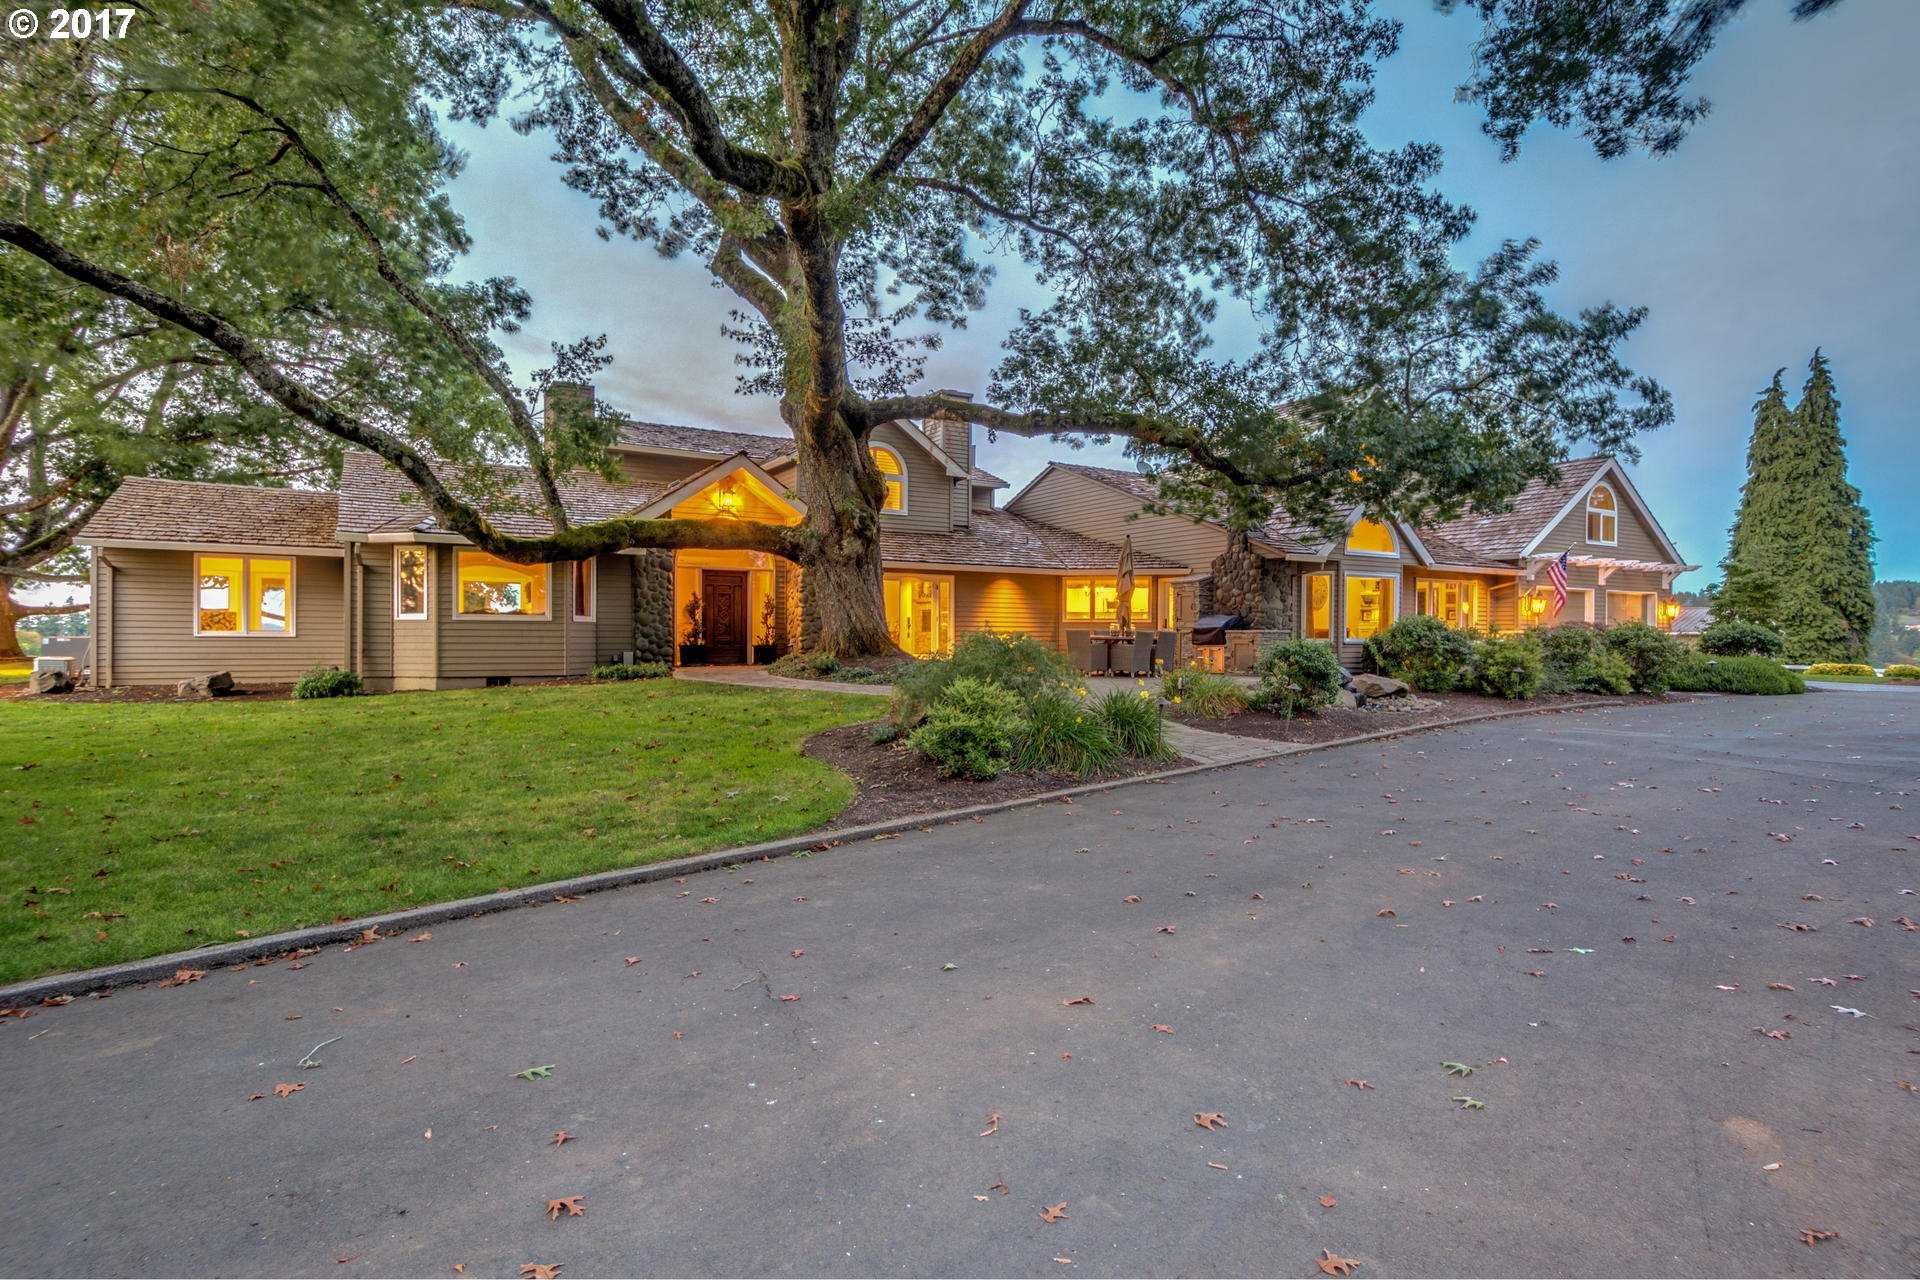 $1,695,000 - 5Br/5Ba -  for Sale in Wilsonville